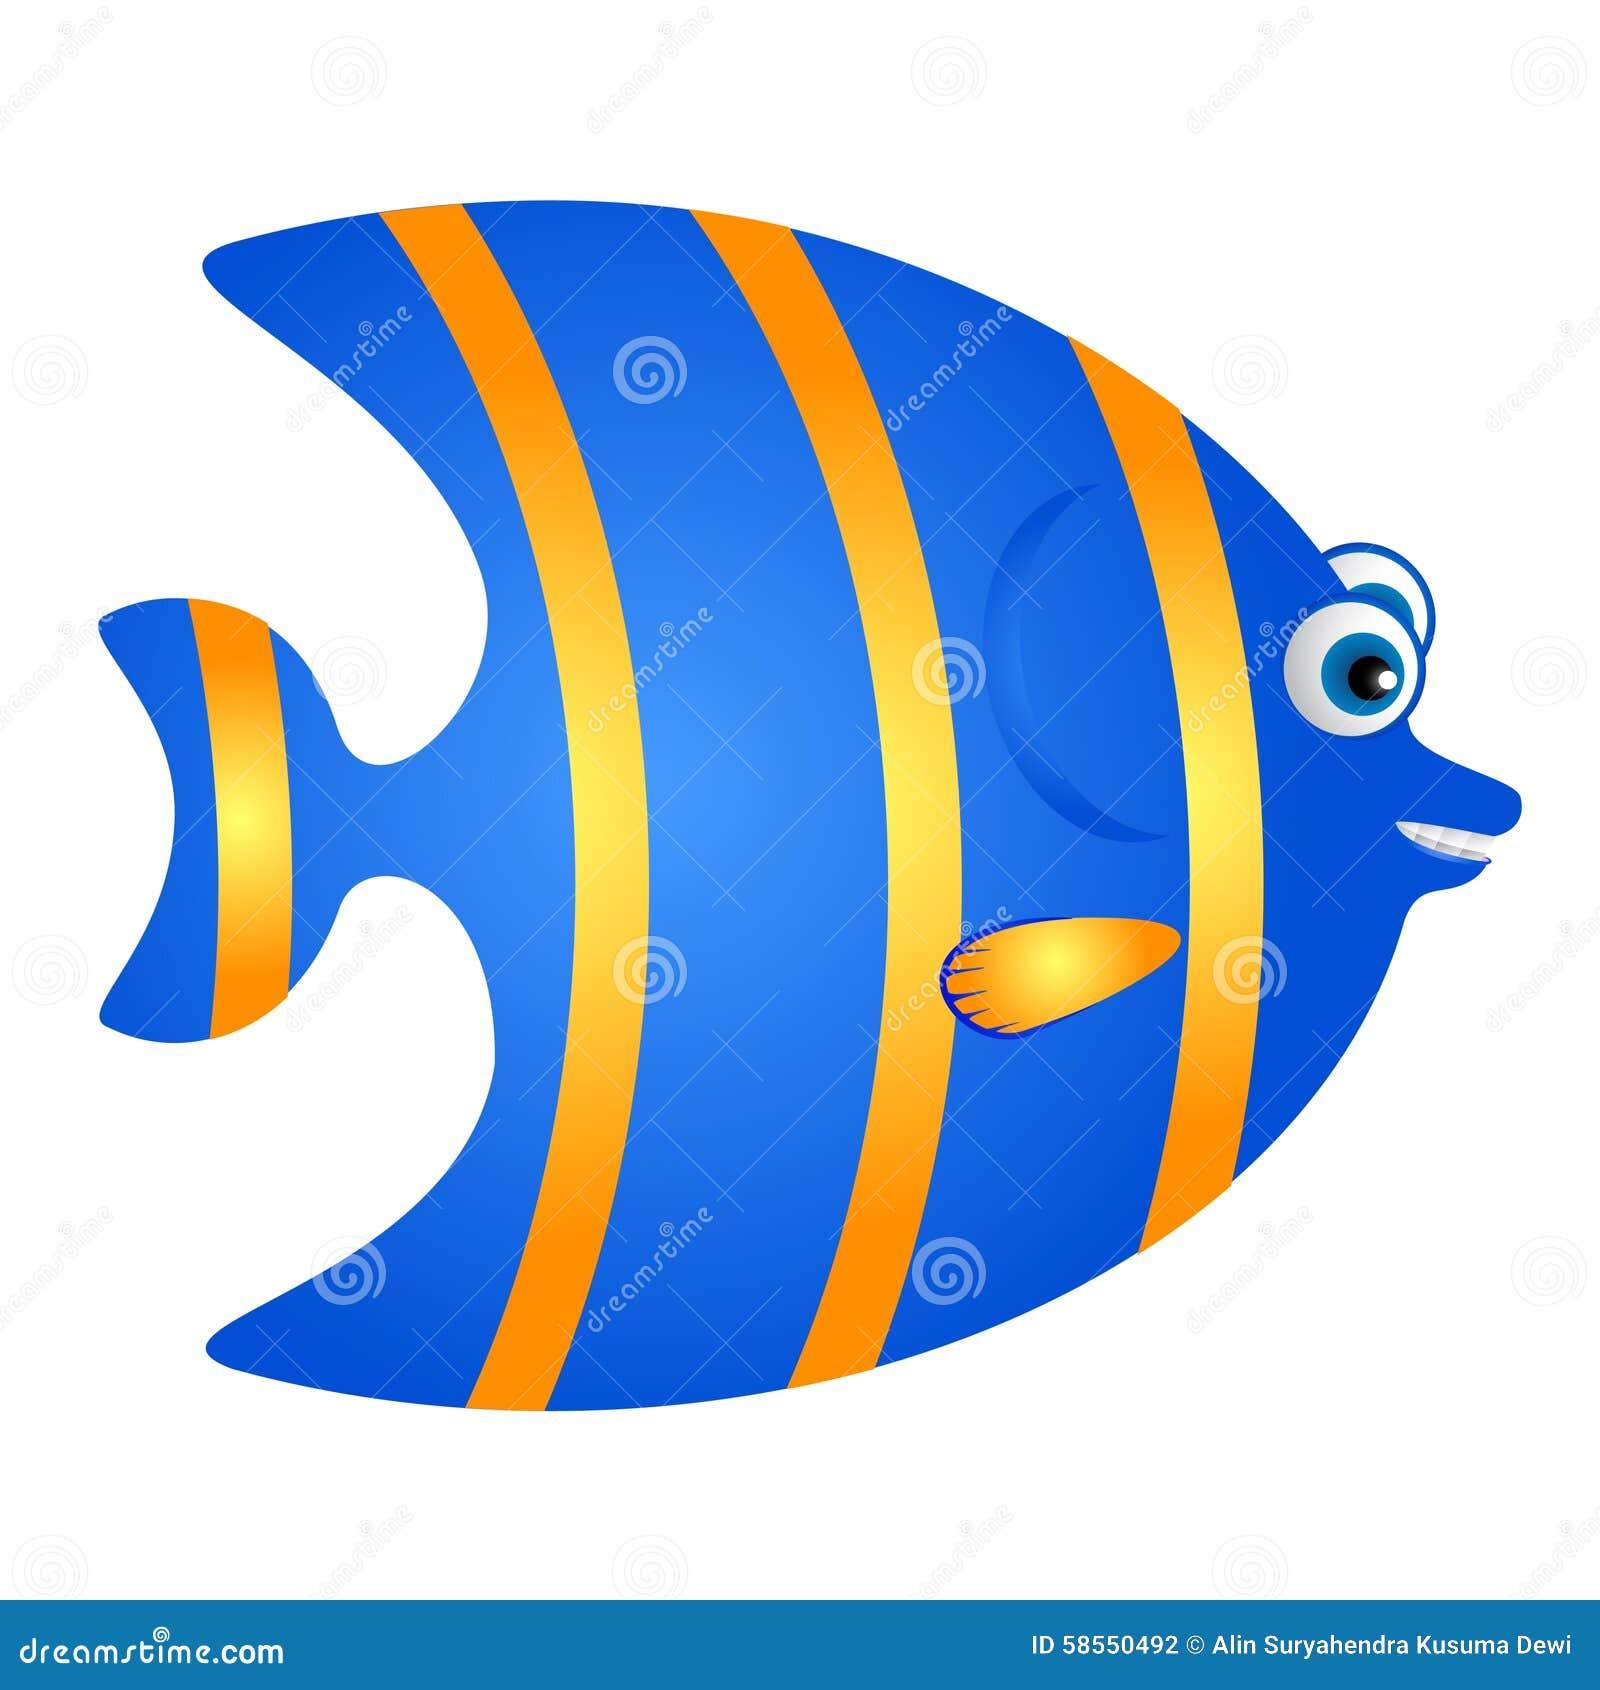 blue and yellow fish cartoon stock vector illustration of marine